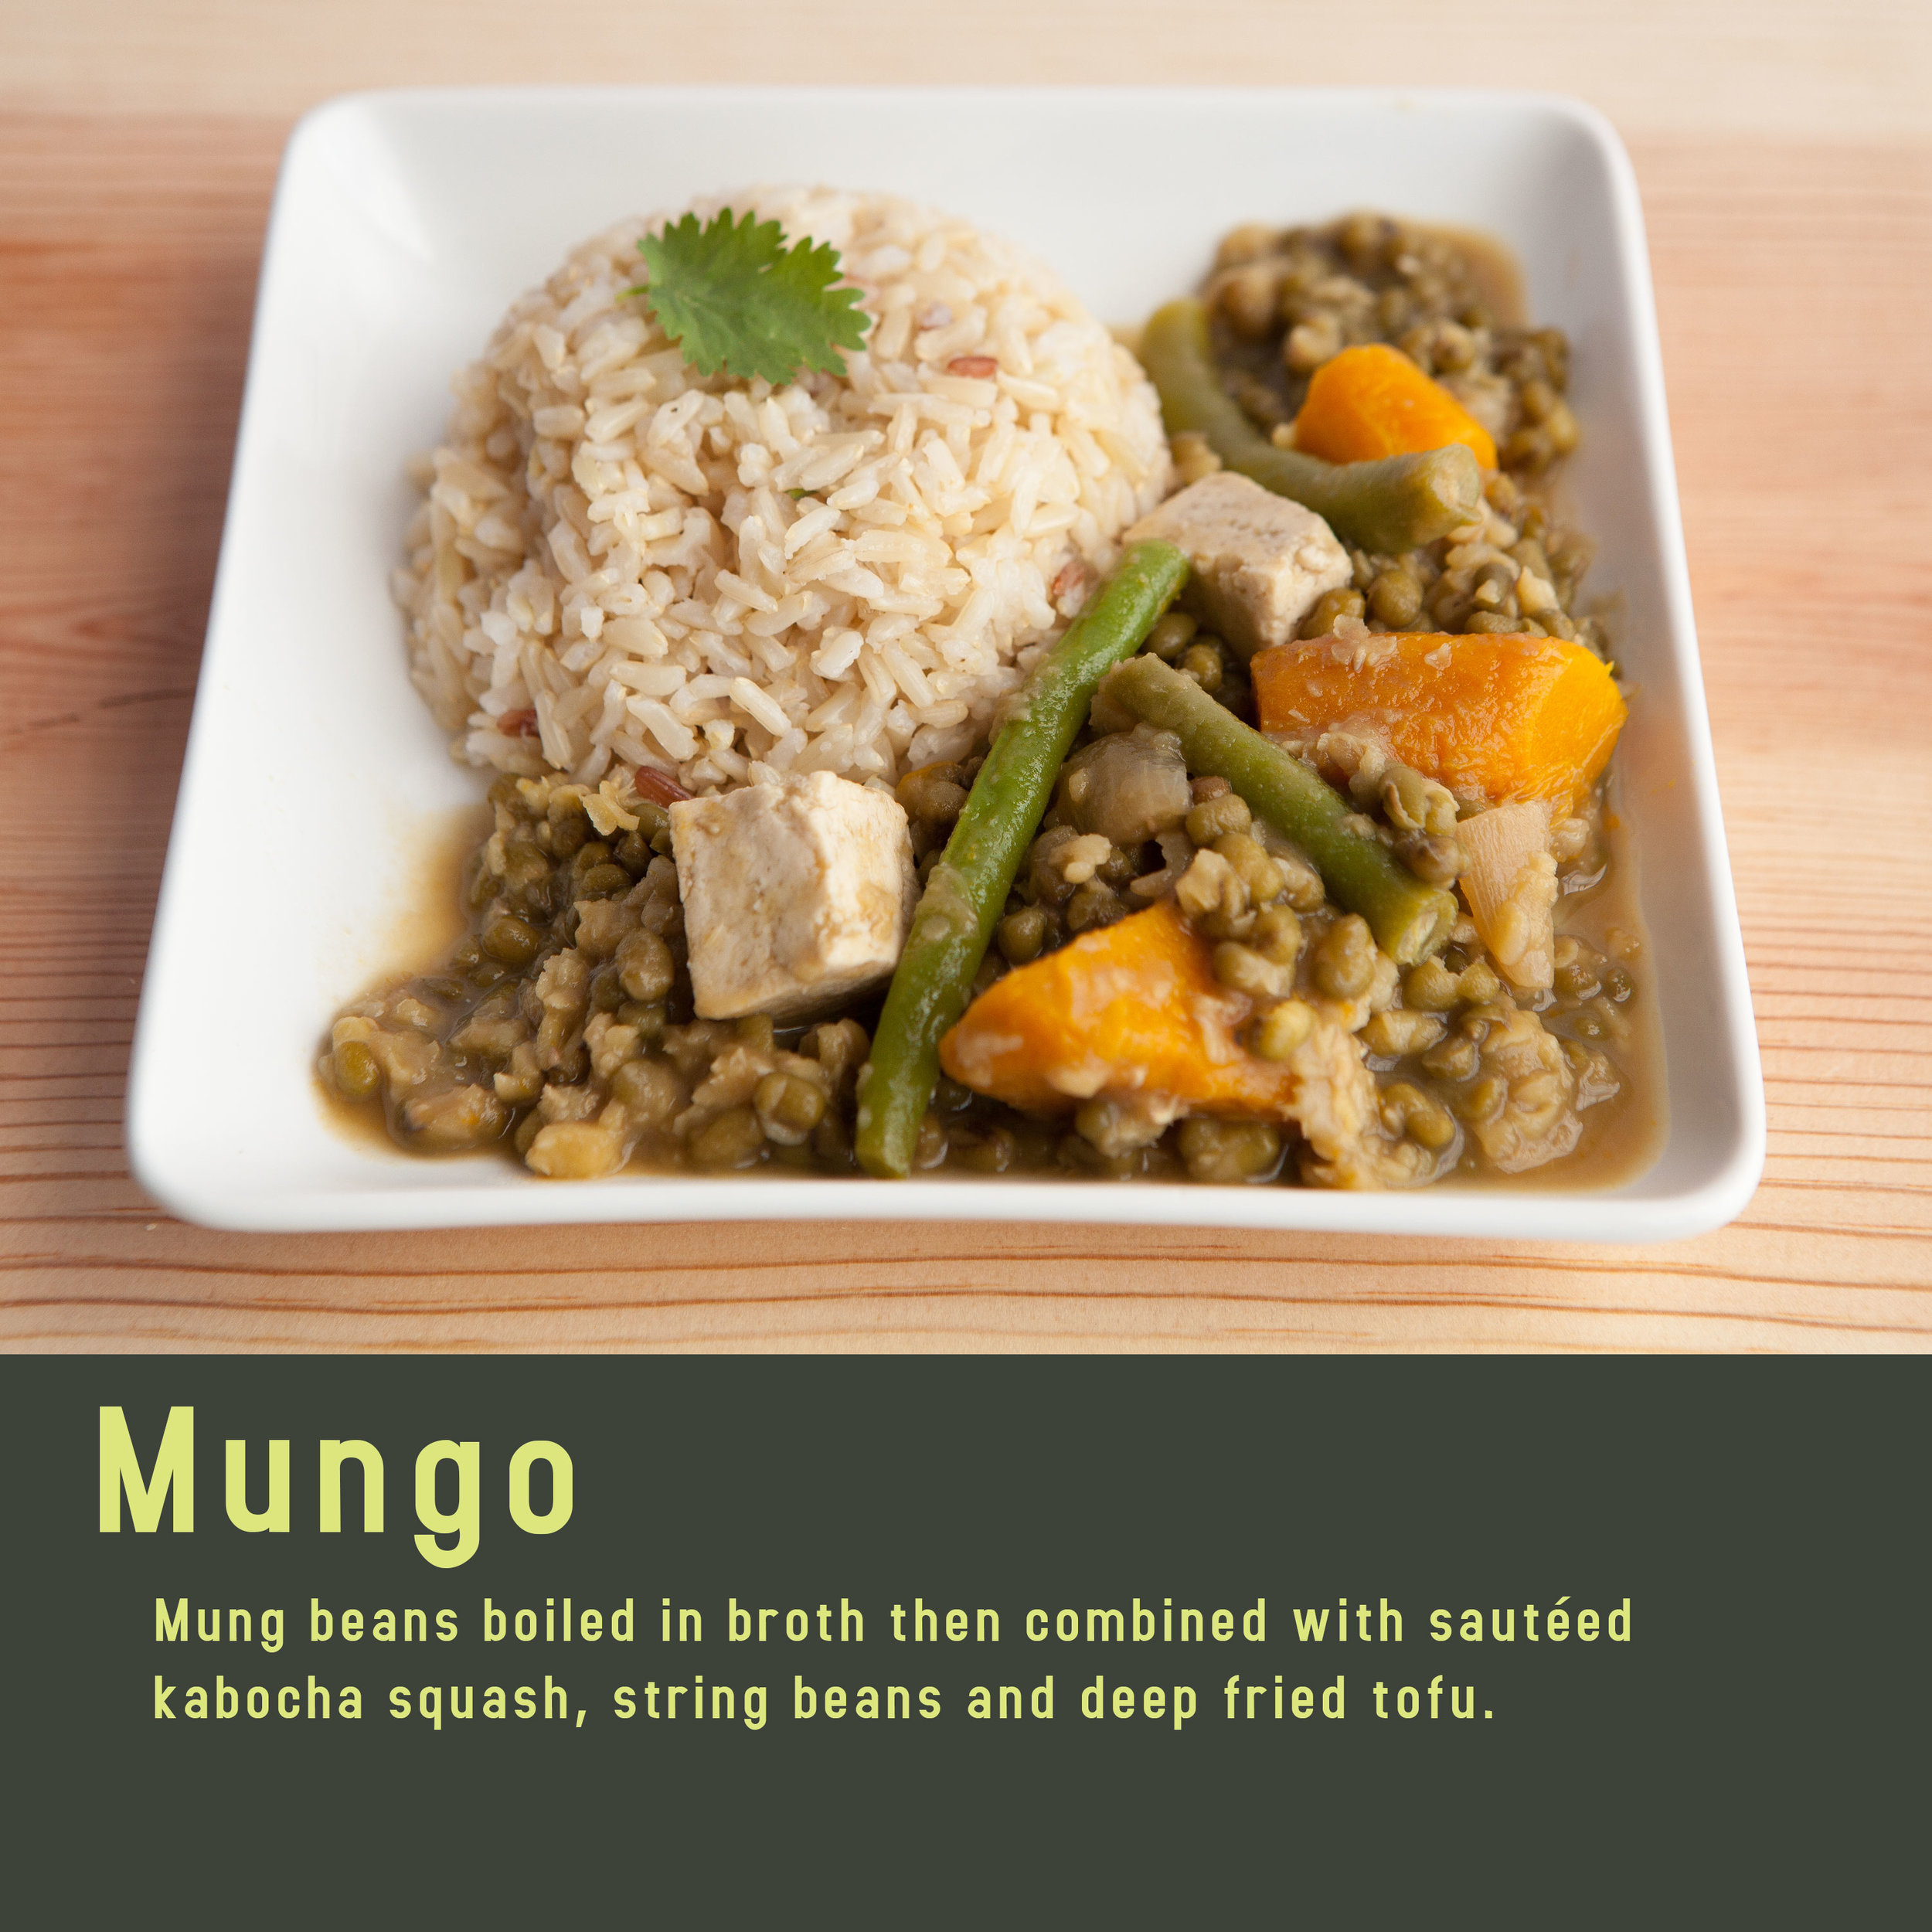 Mungo-1 (1).jpg